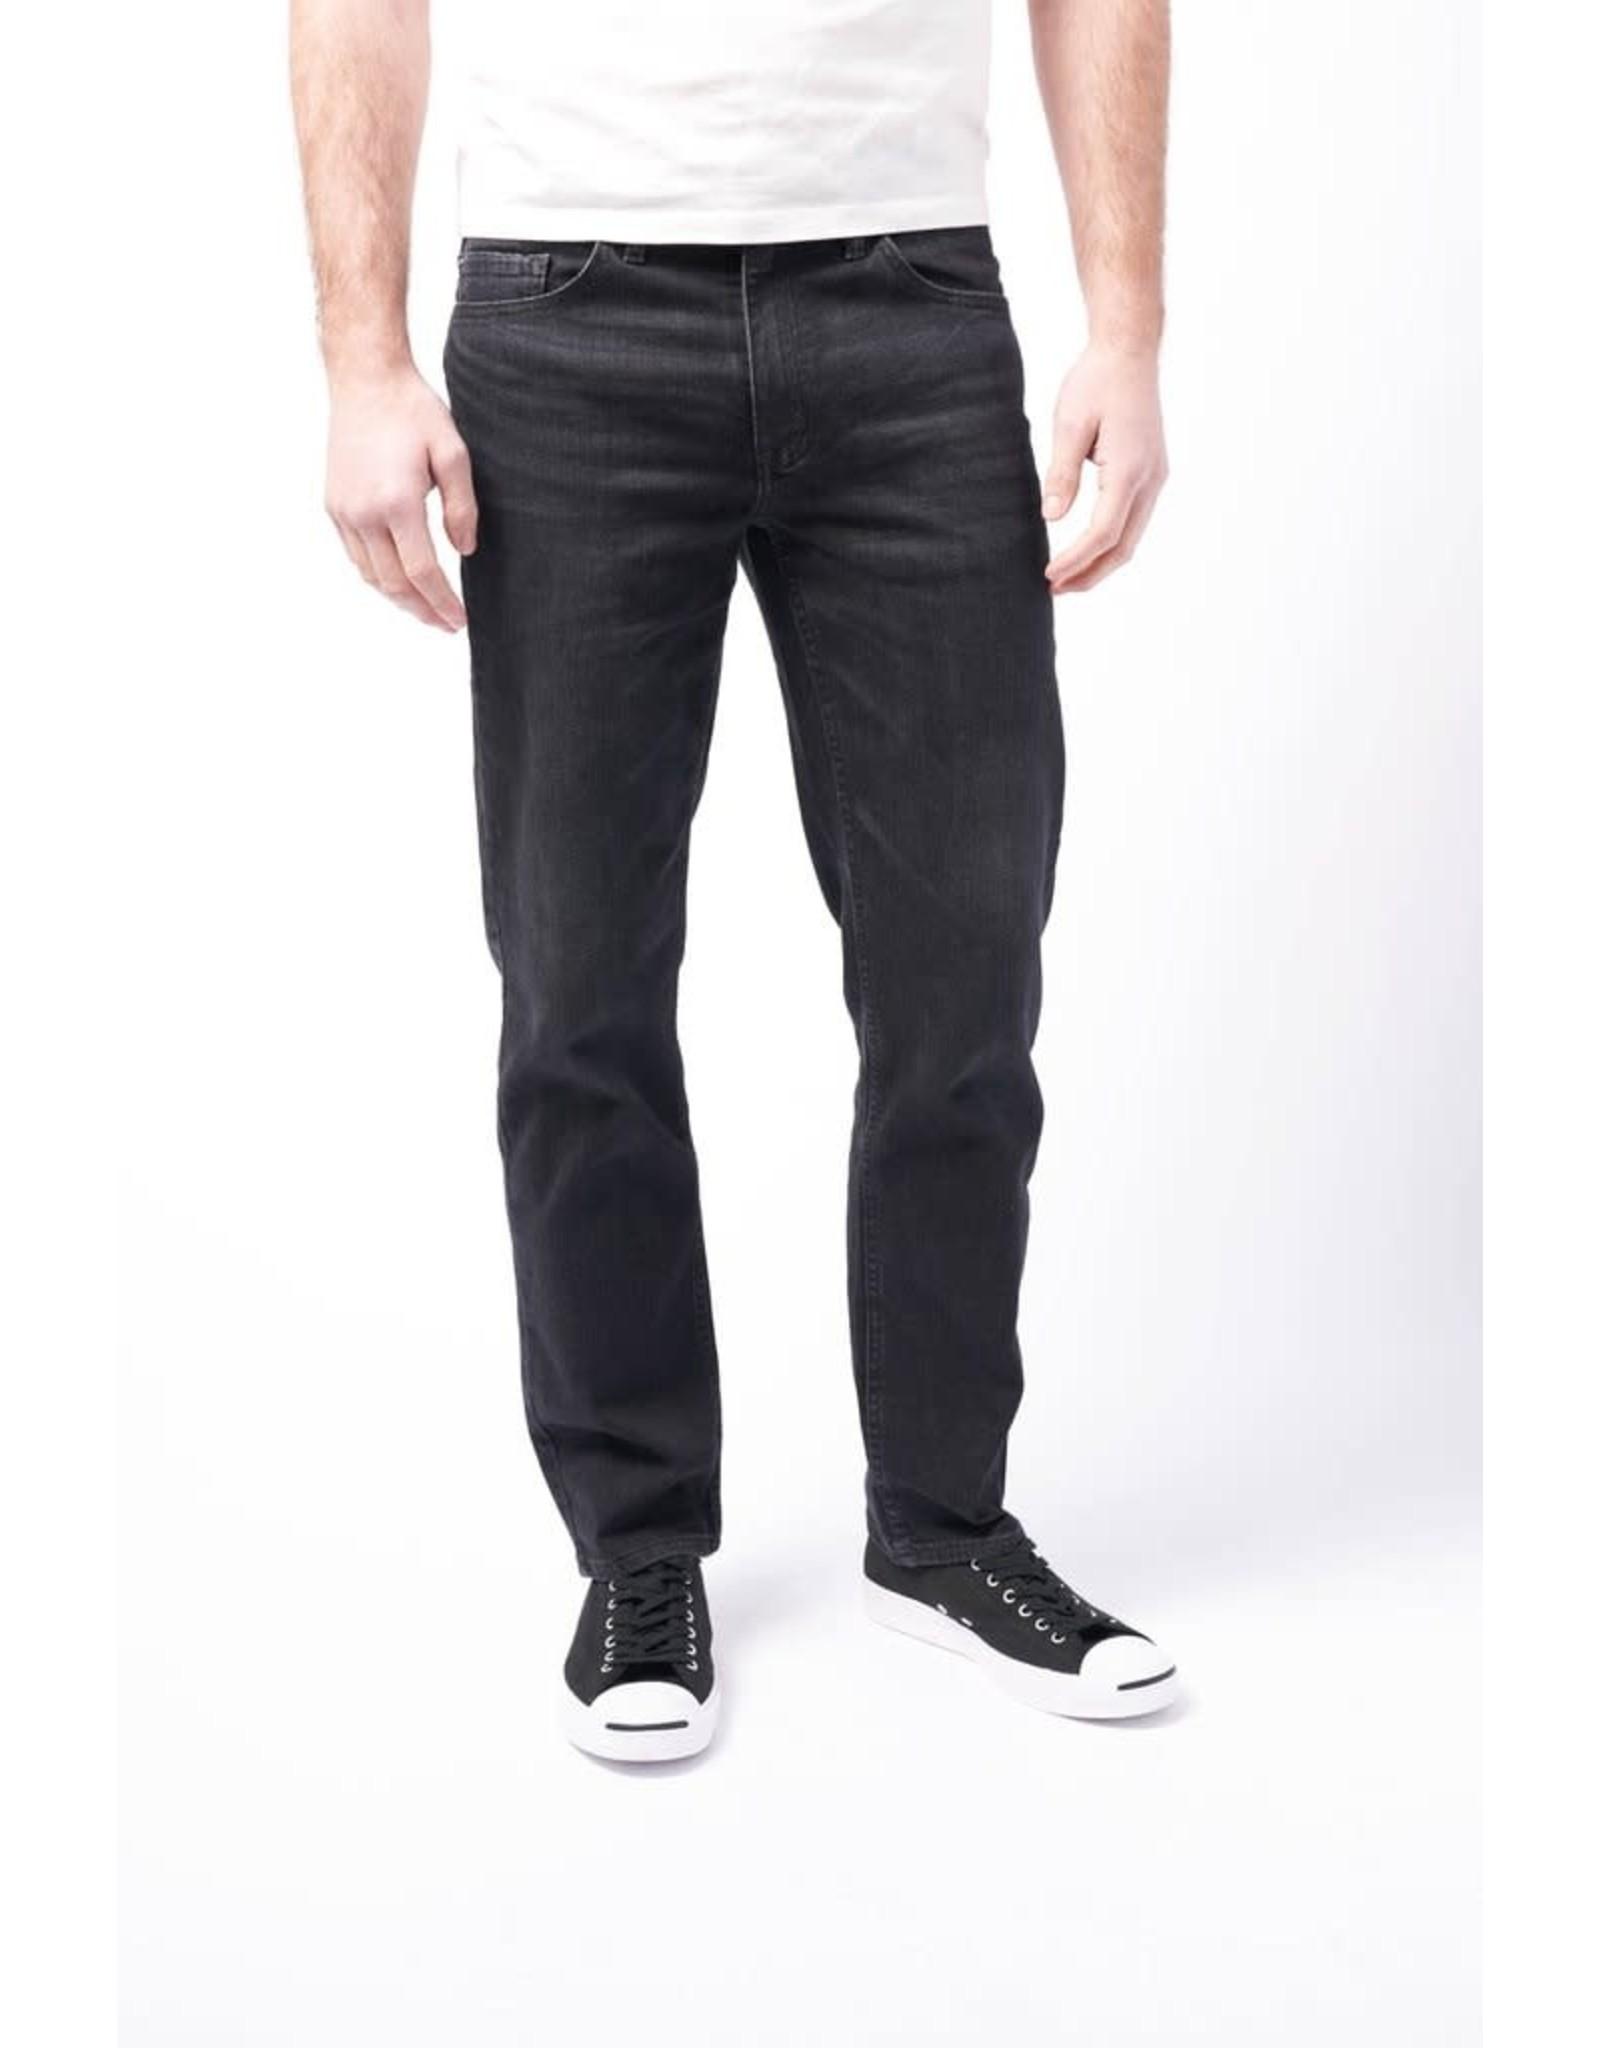 '76 Mens Mercantile Slim Straight Men's Jean